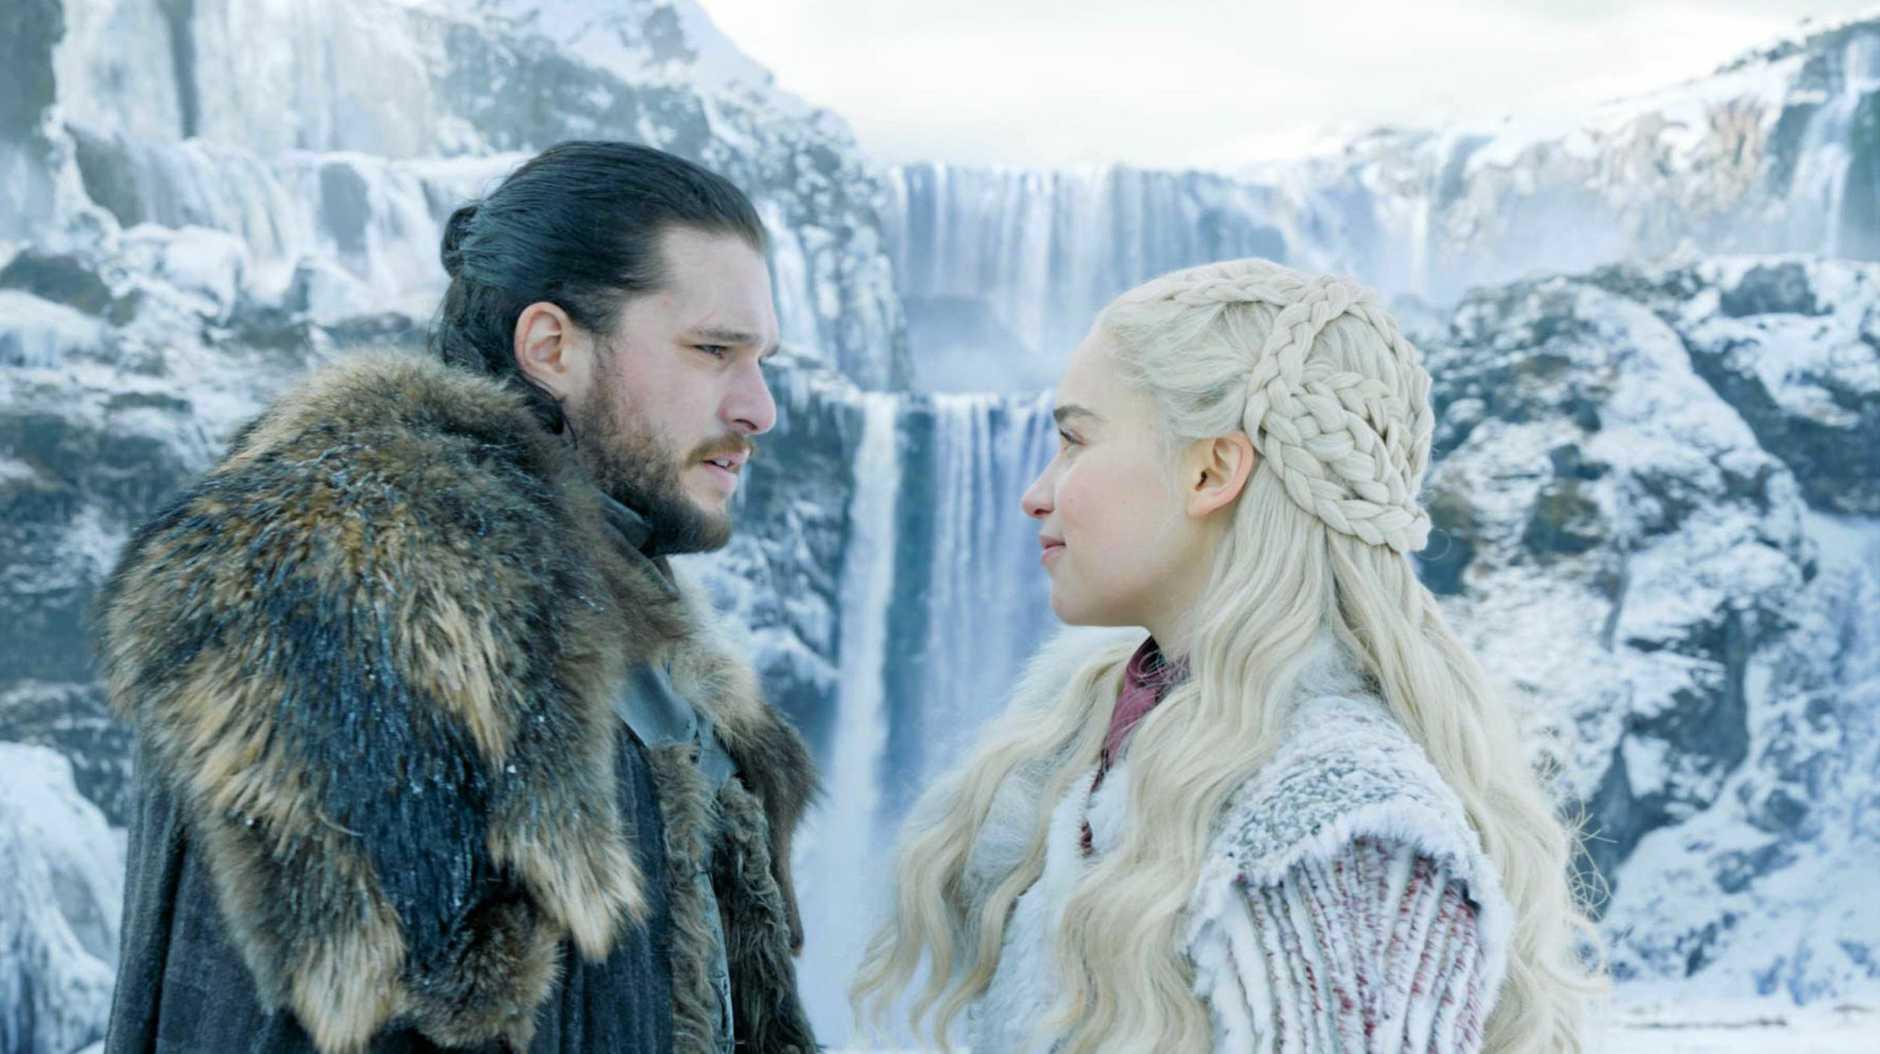 Kit Harington as Jon Snow and Emilia Clarke as Daenerys Targaryen in a scene from Game of Thrones season 8.